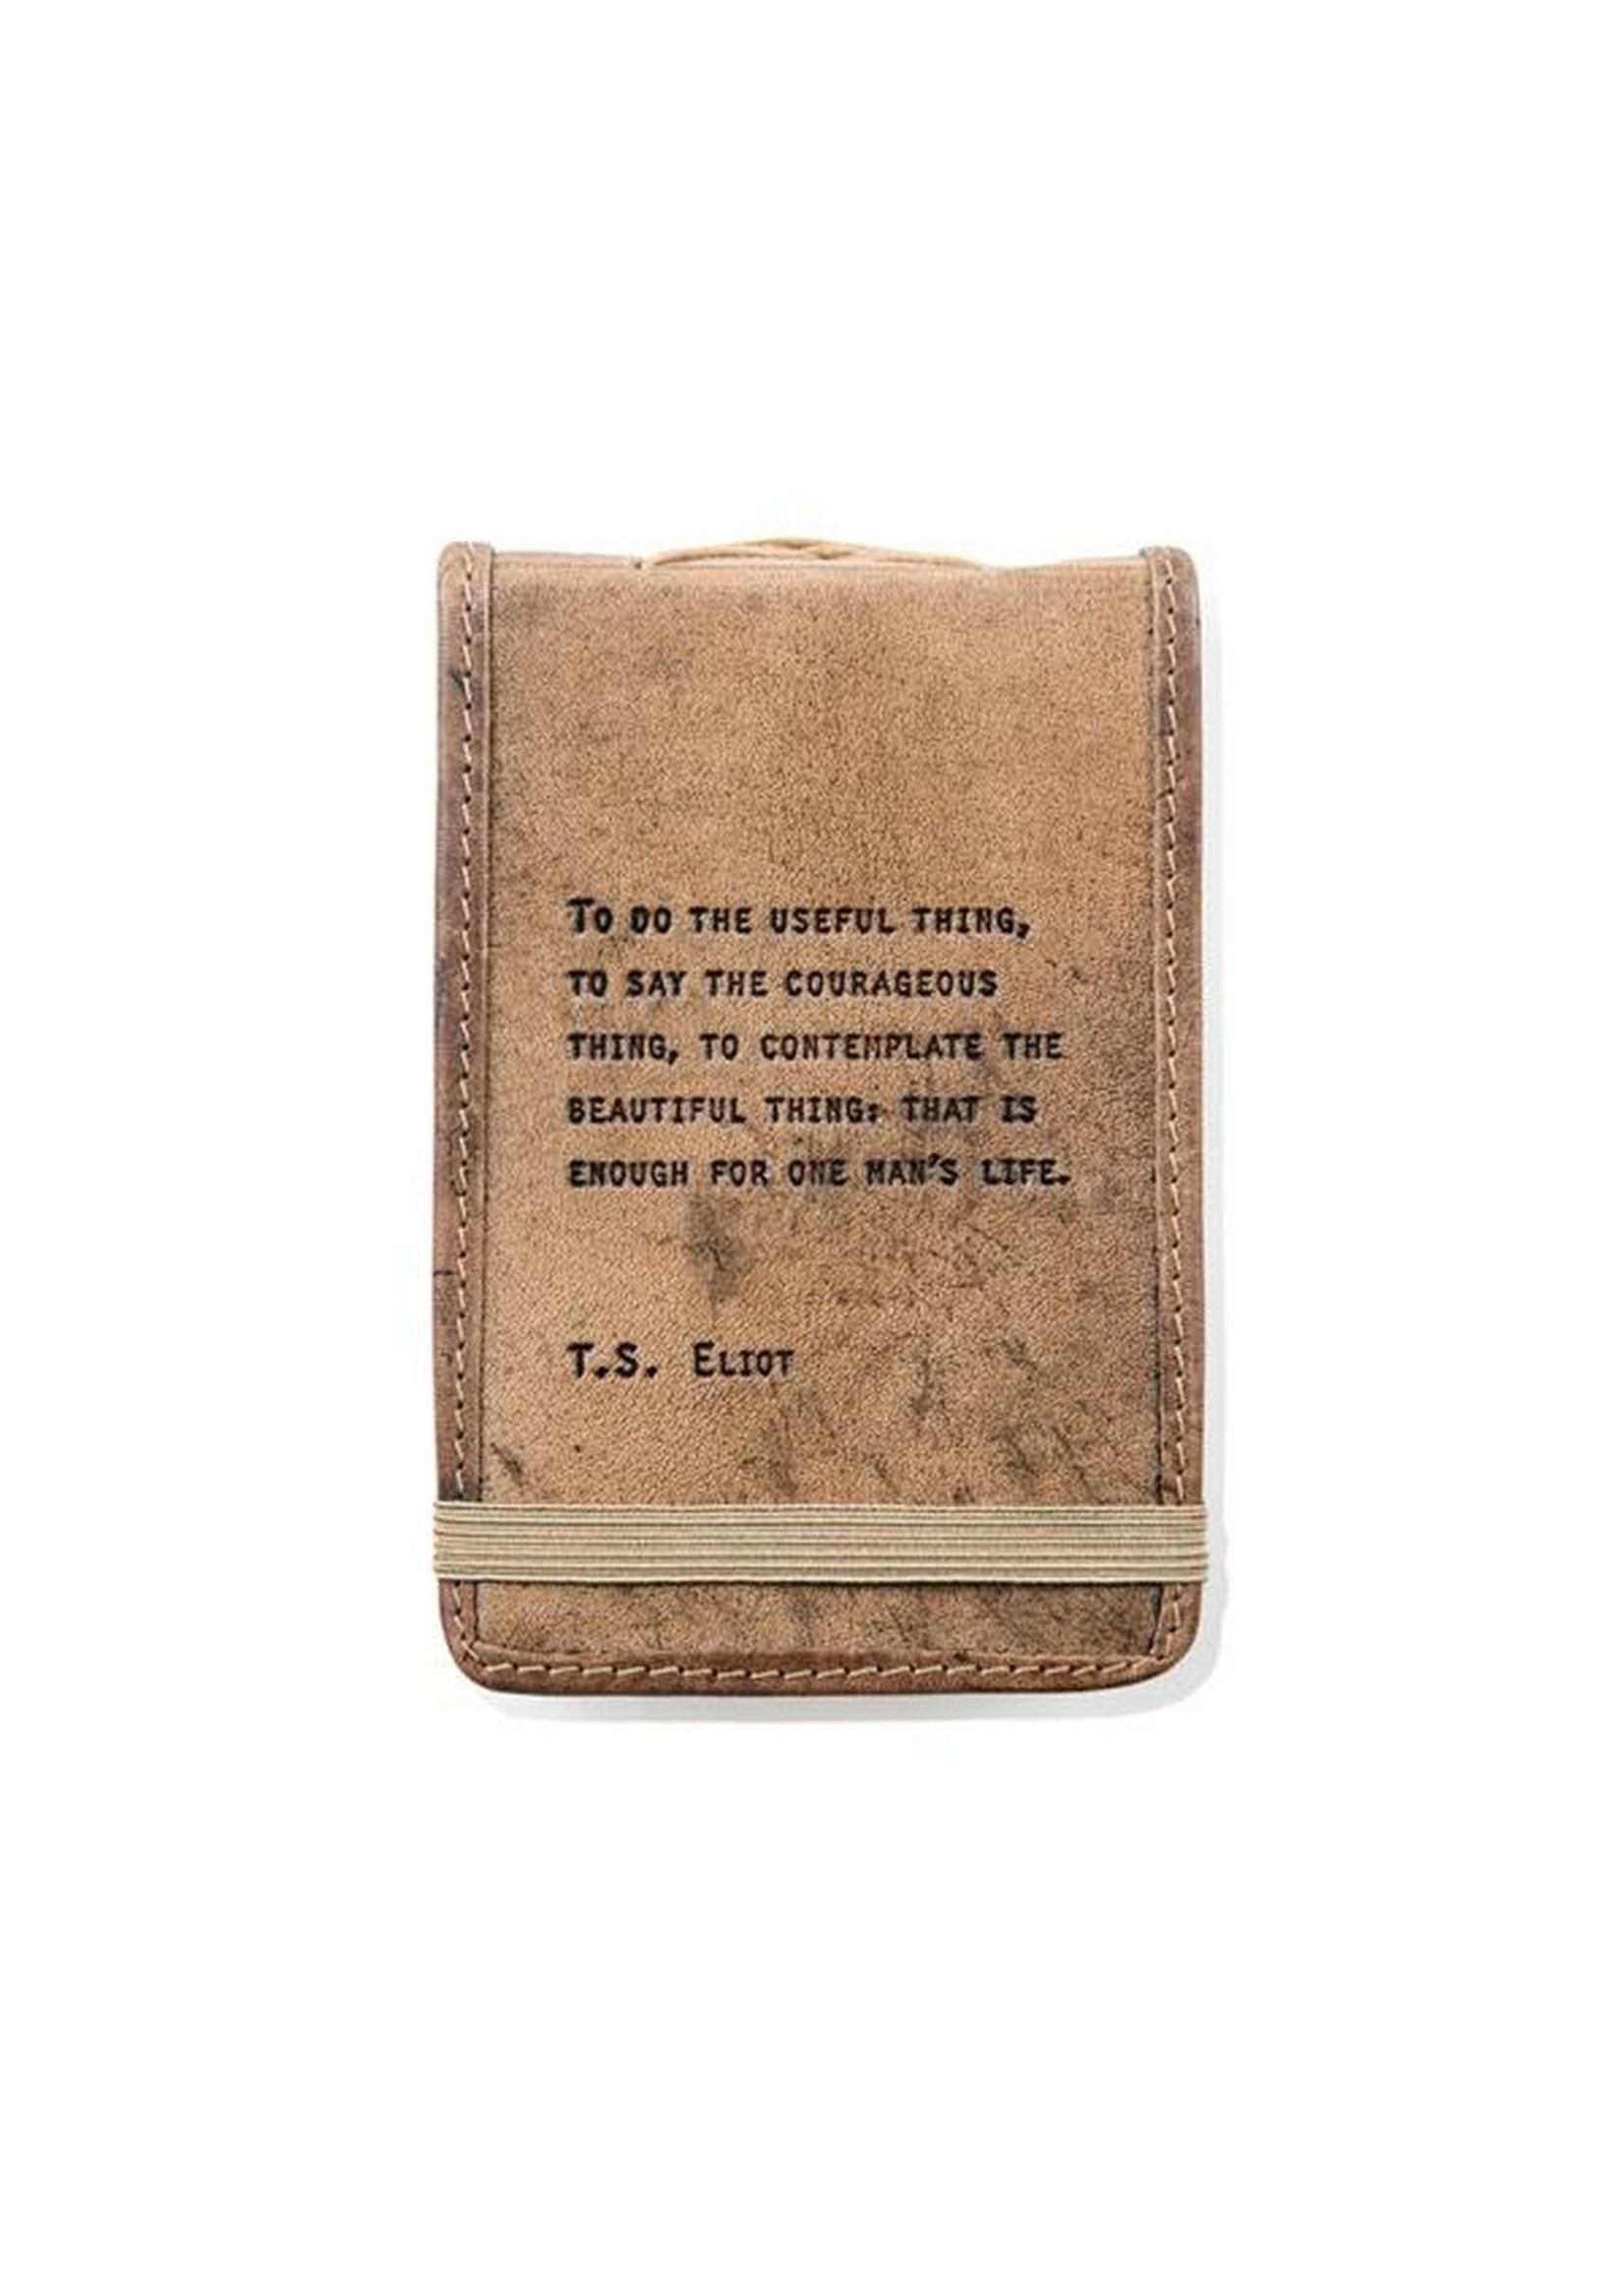 Sugarboo Mini Leather Journal - TS Elliot (4x6)